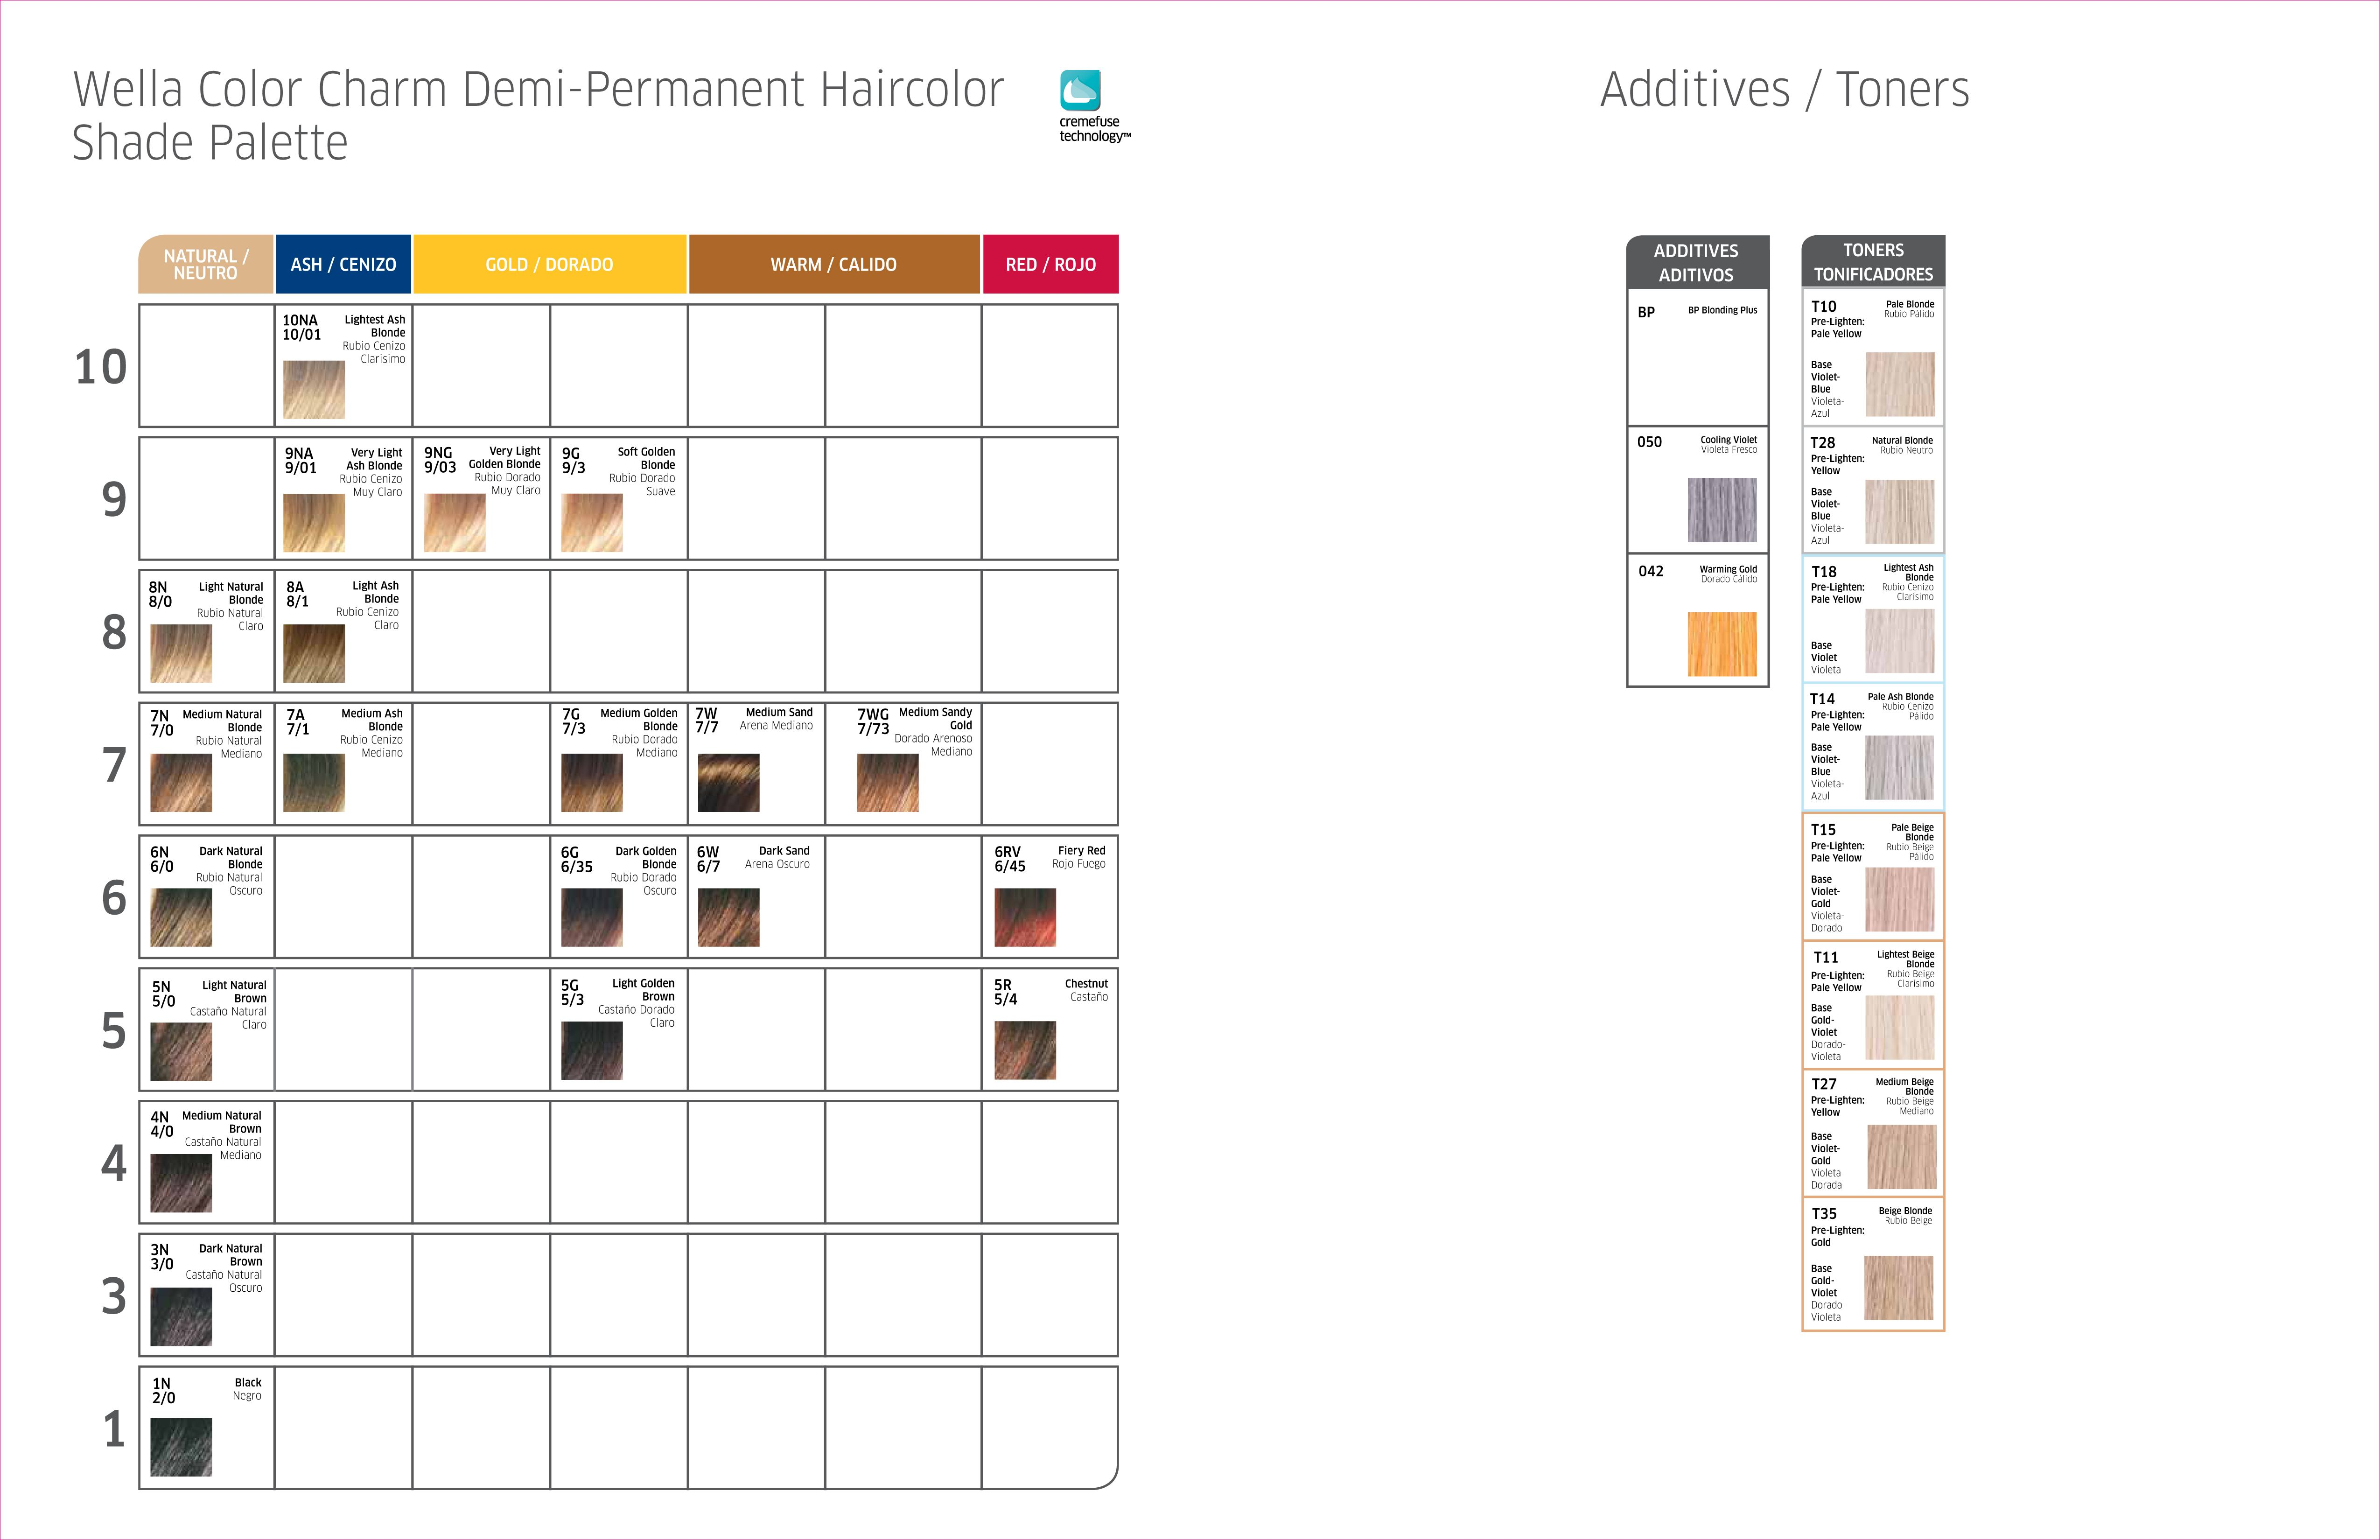 Wella Color Charm Demi Permanent Haircolor Shade Palette Additives Amp Toners